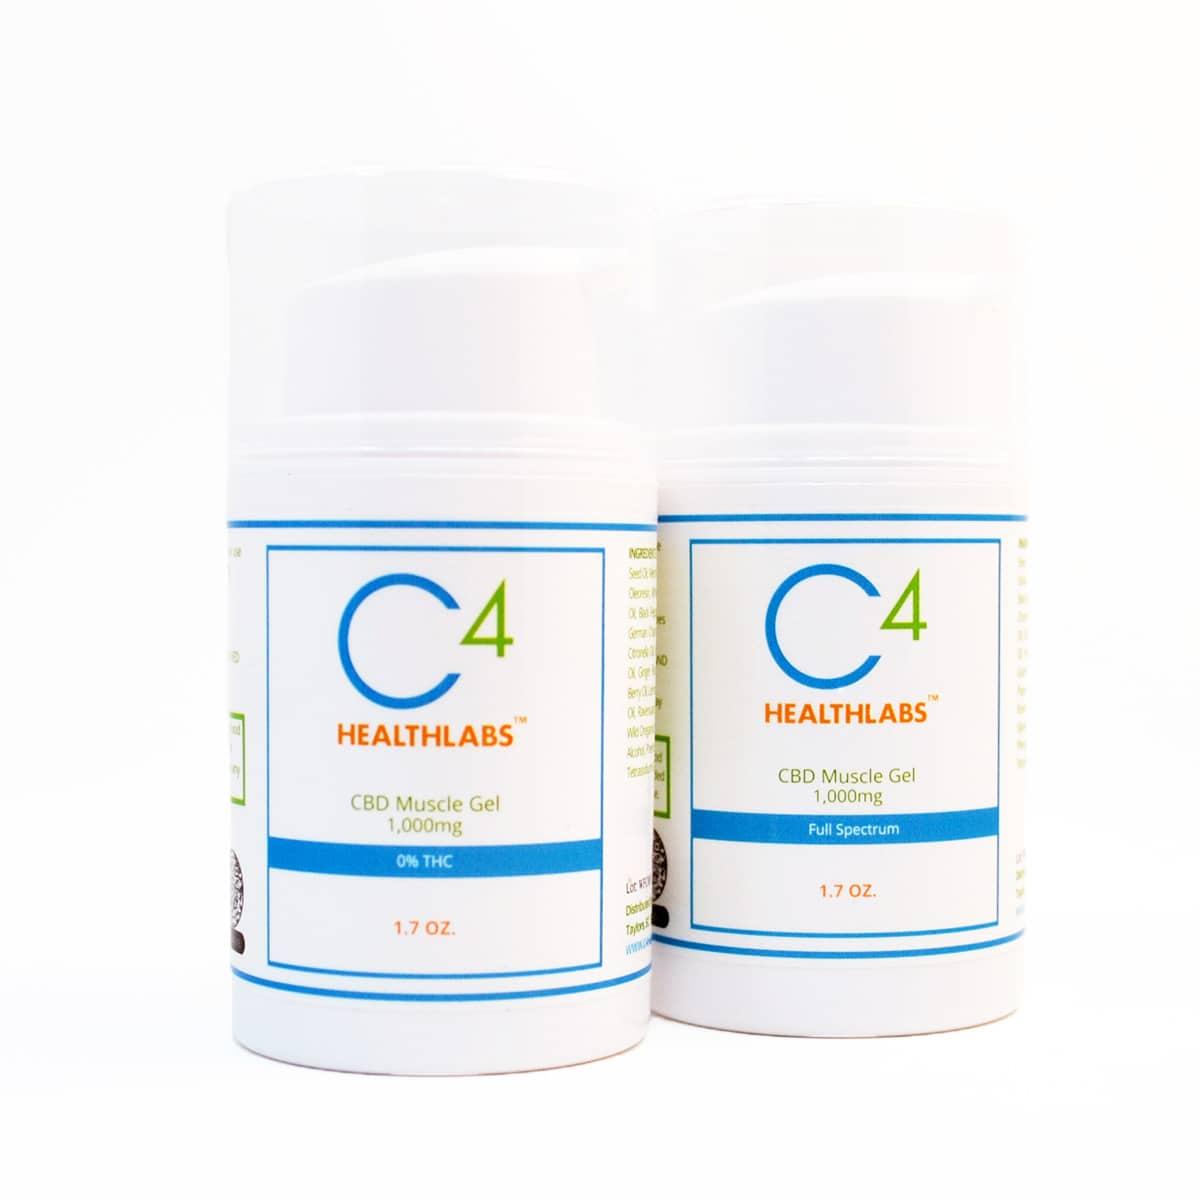 c4 healthlabs cbd muscle gel